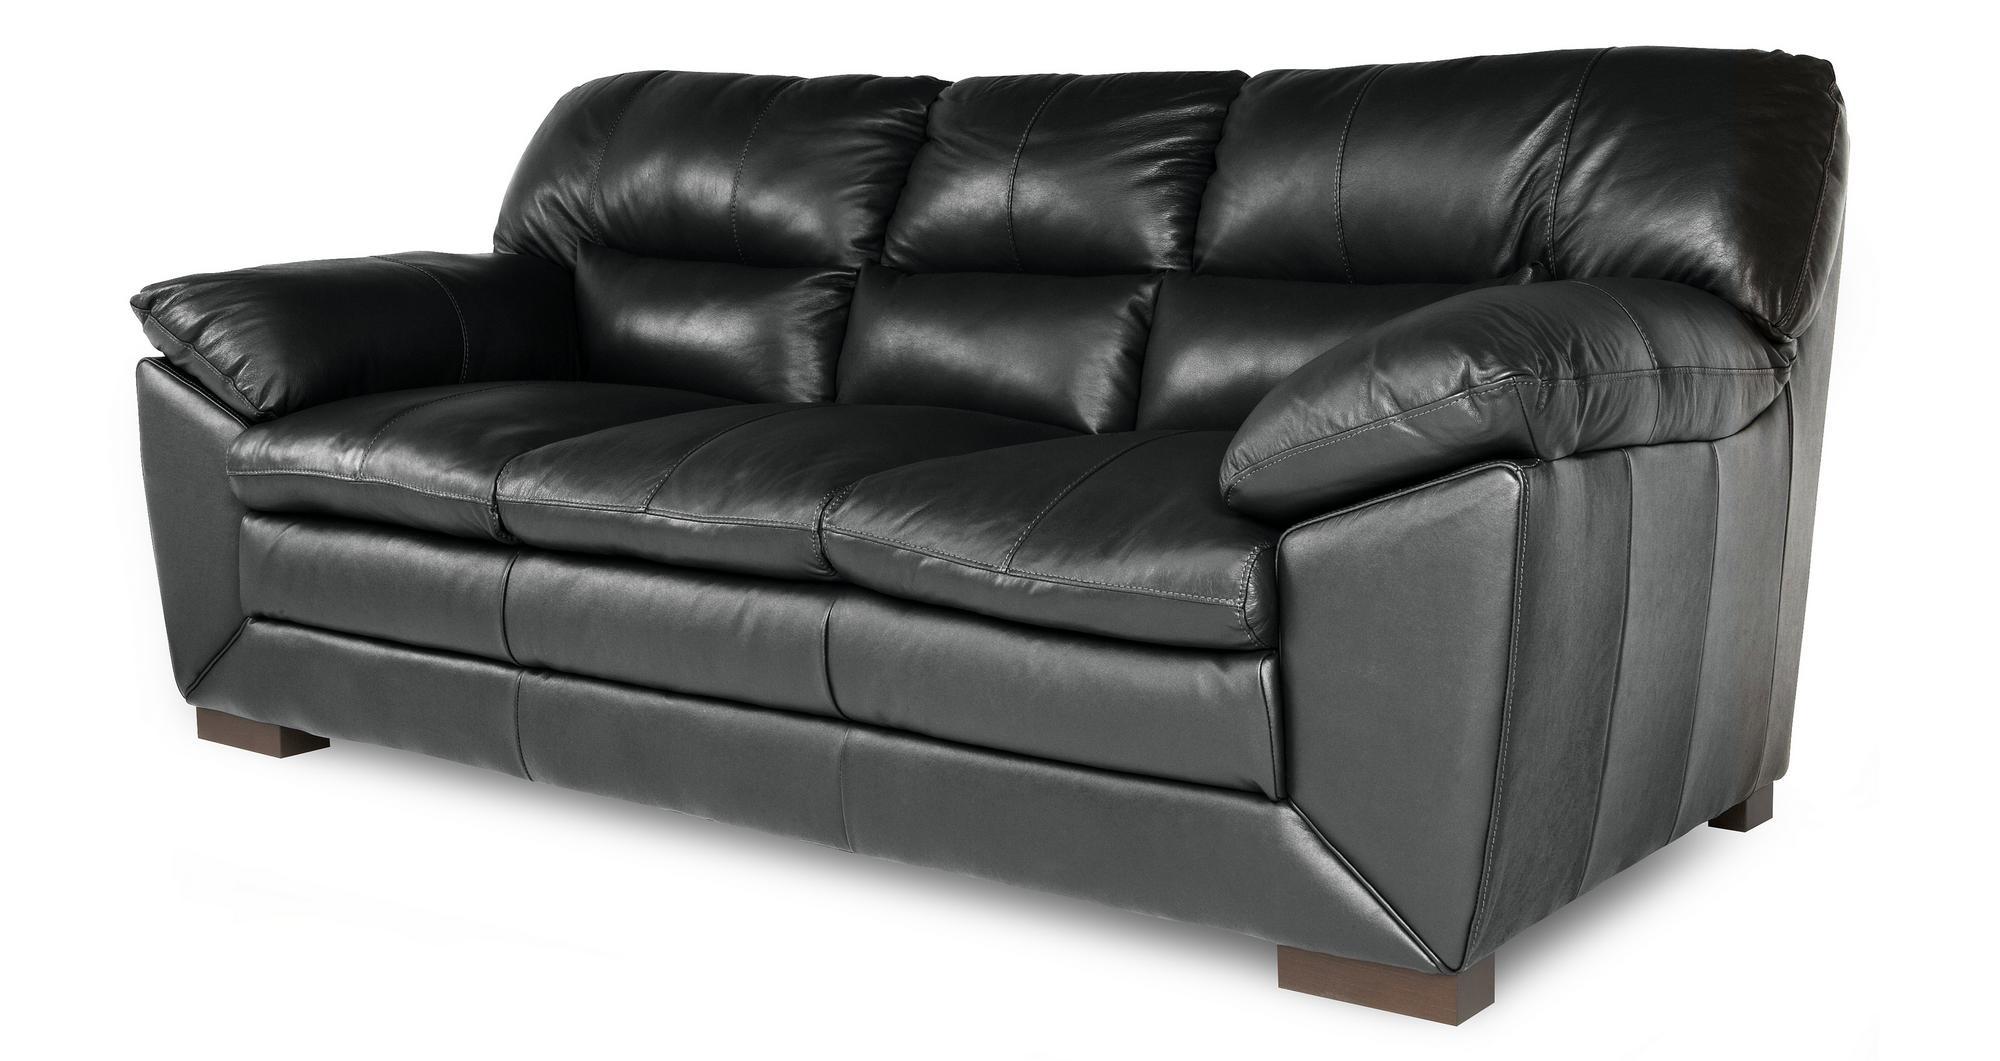 Dfs three seater sofas refil sofa Dfs 4 seater leather sofa